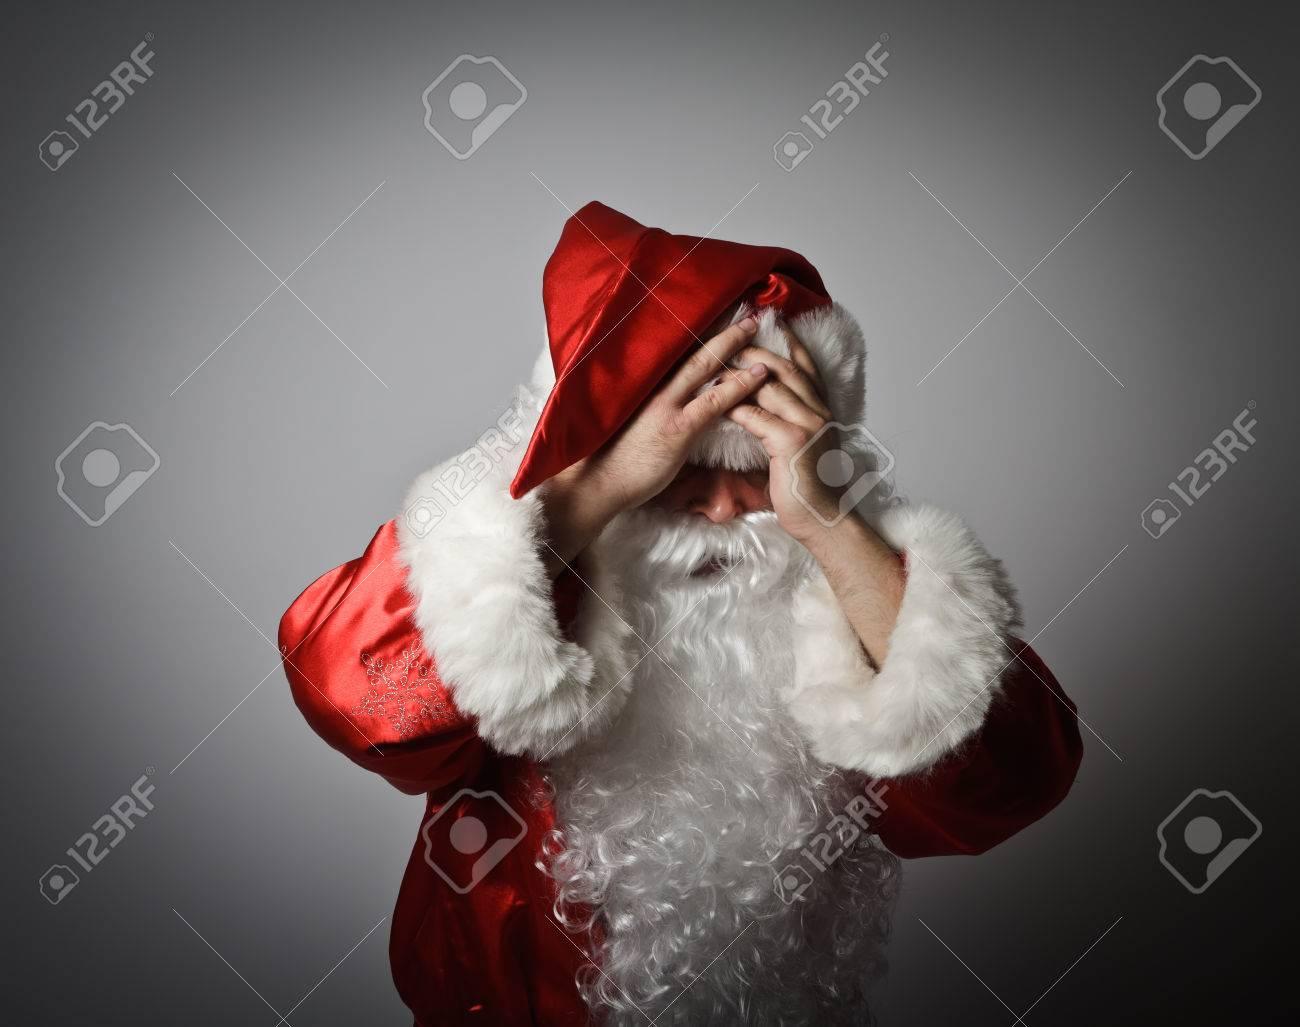 50677872-Frustrated-Santa-Claus-Santa-Cl